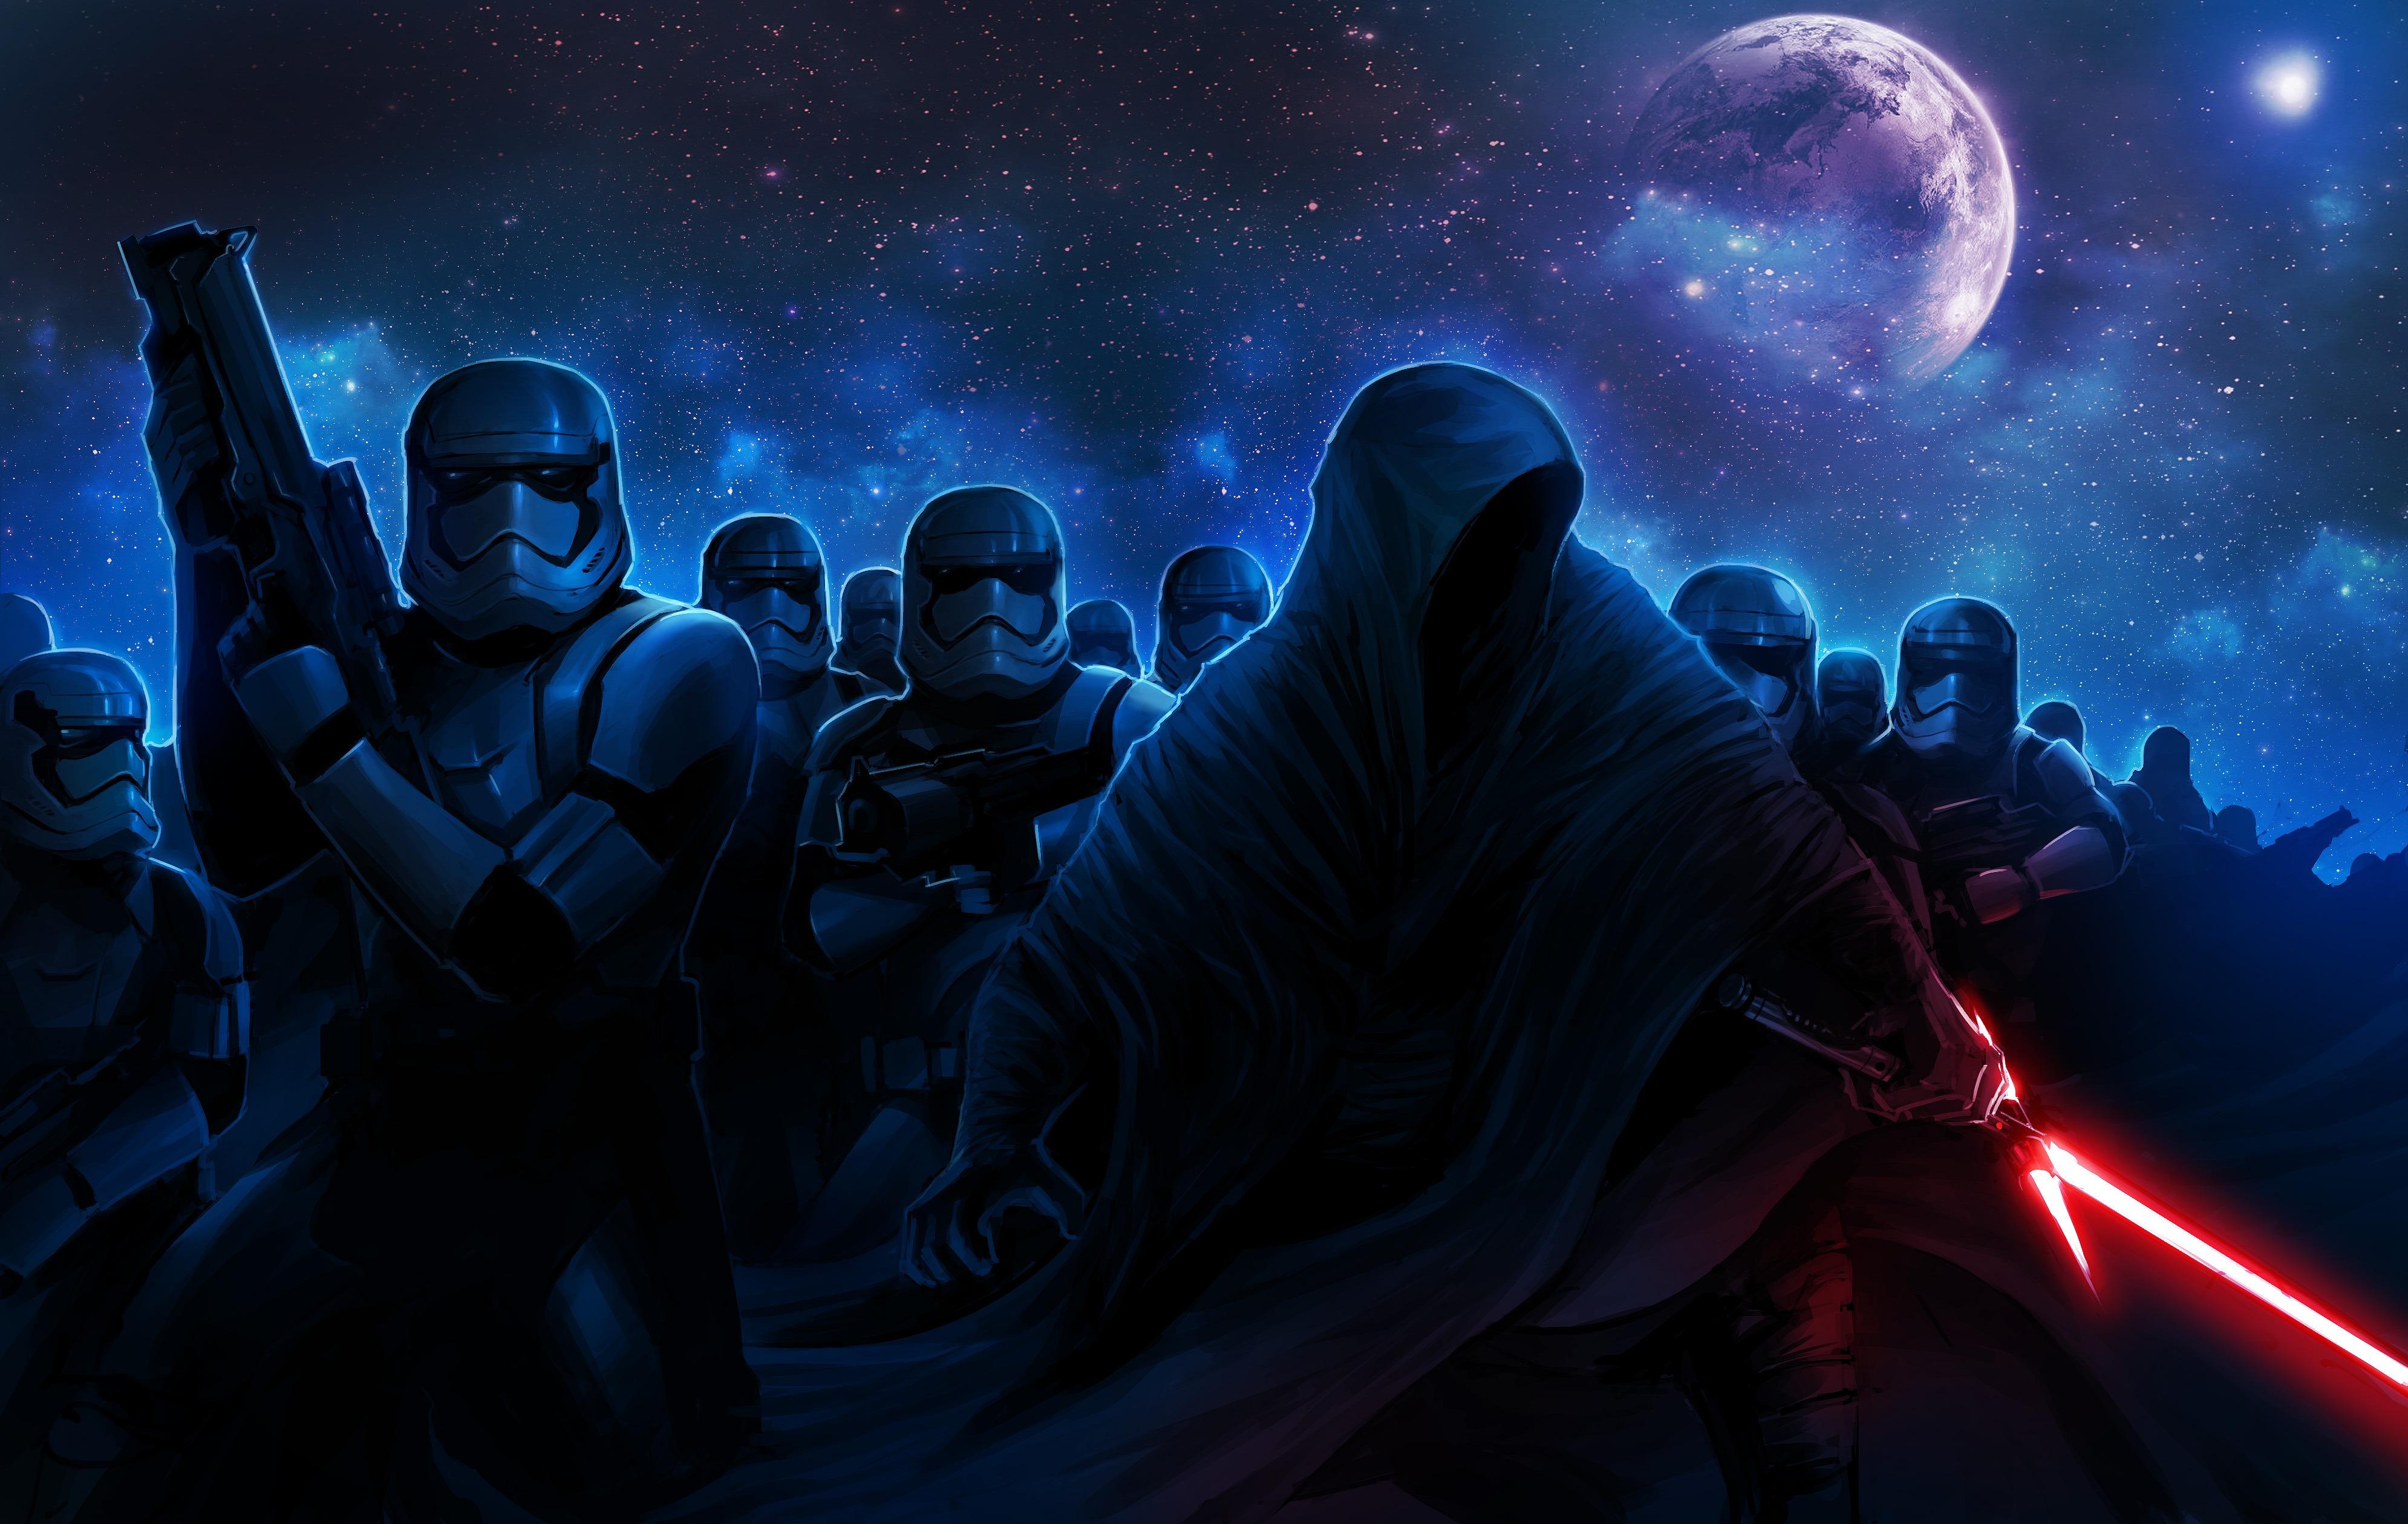 Star Wars the Force Awakens wallpaper 5